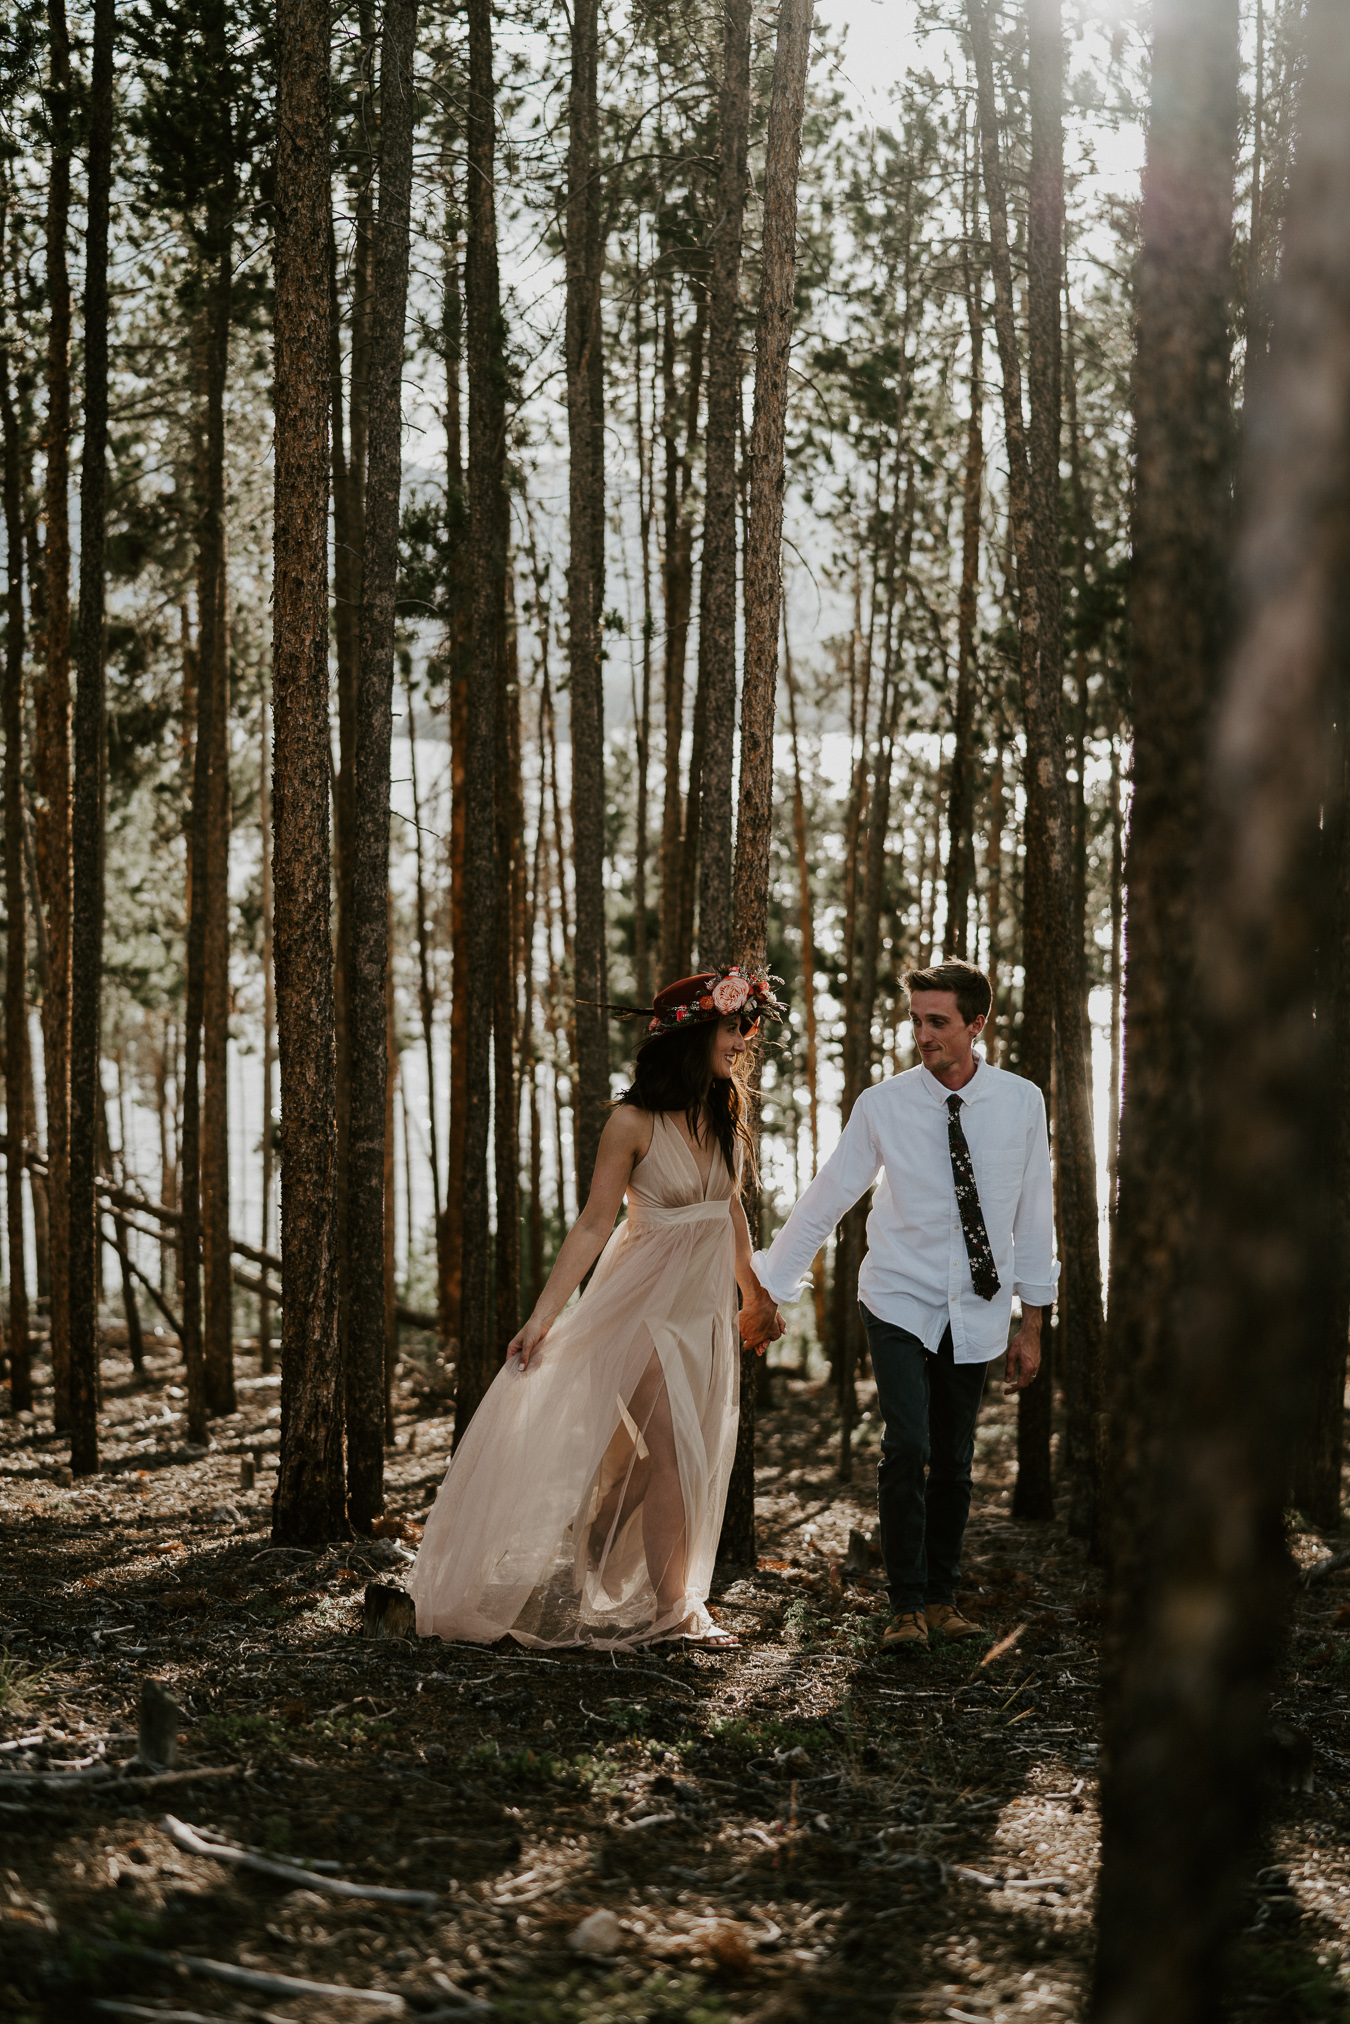 breckenridge bride and groom